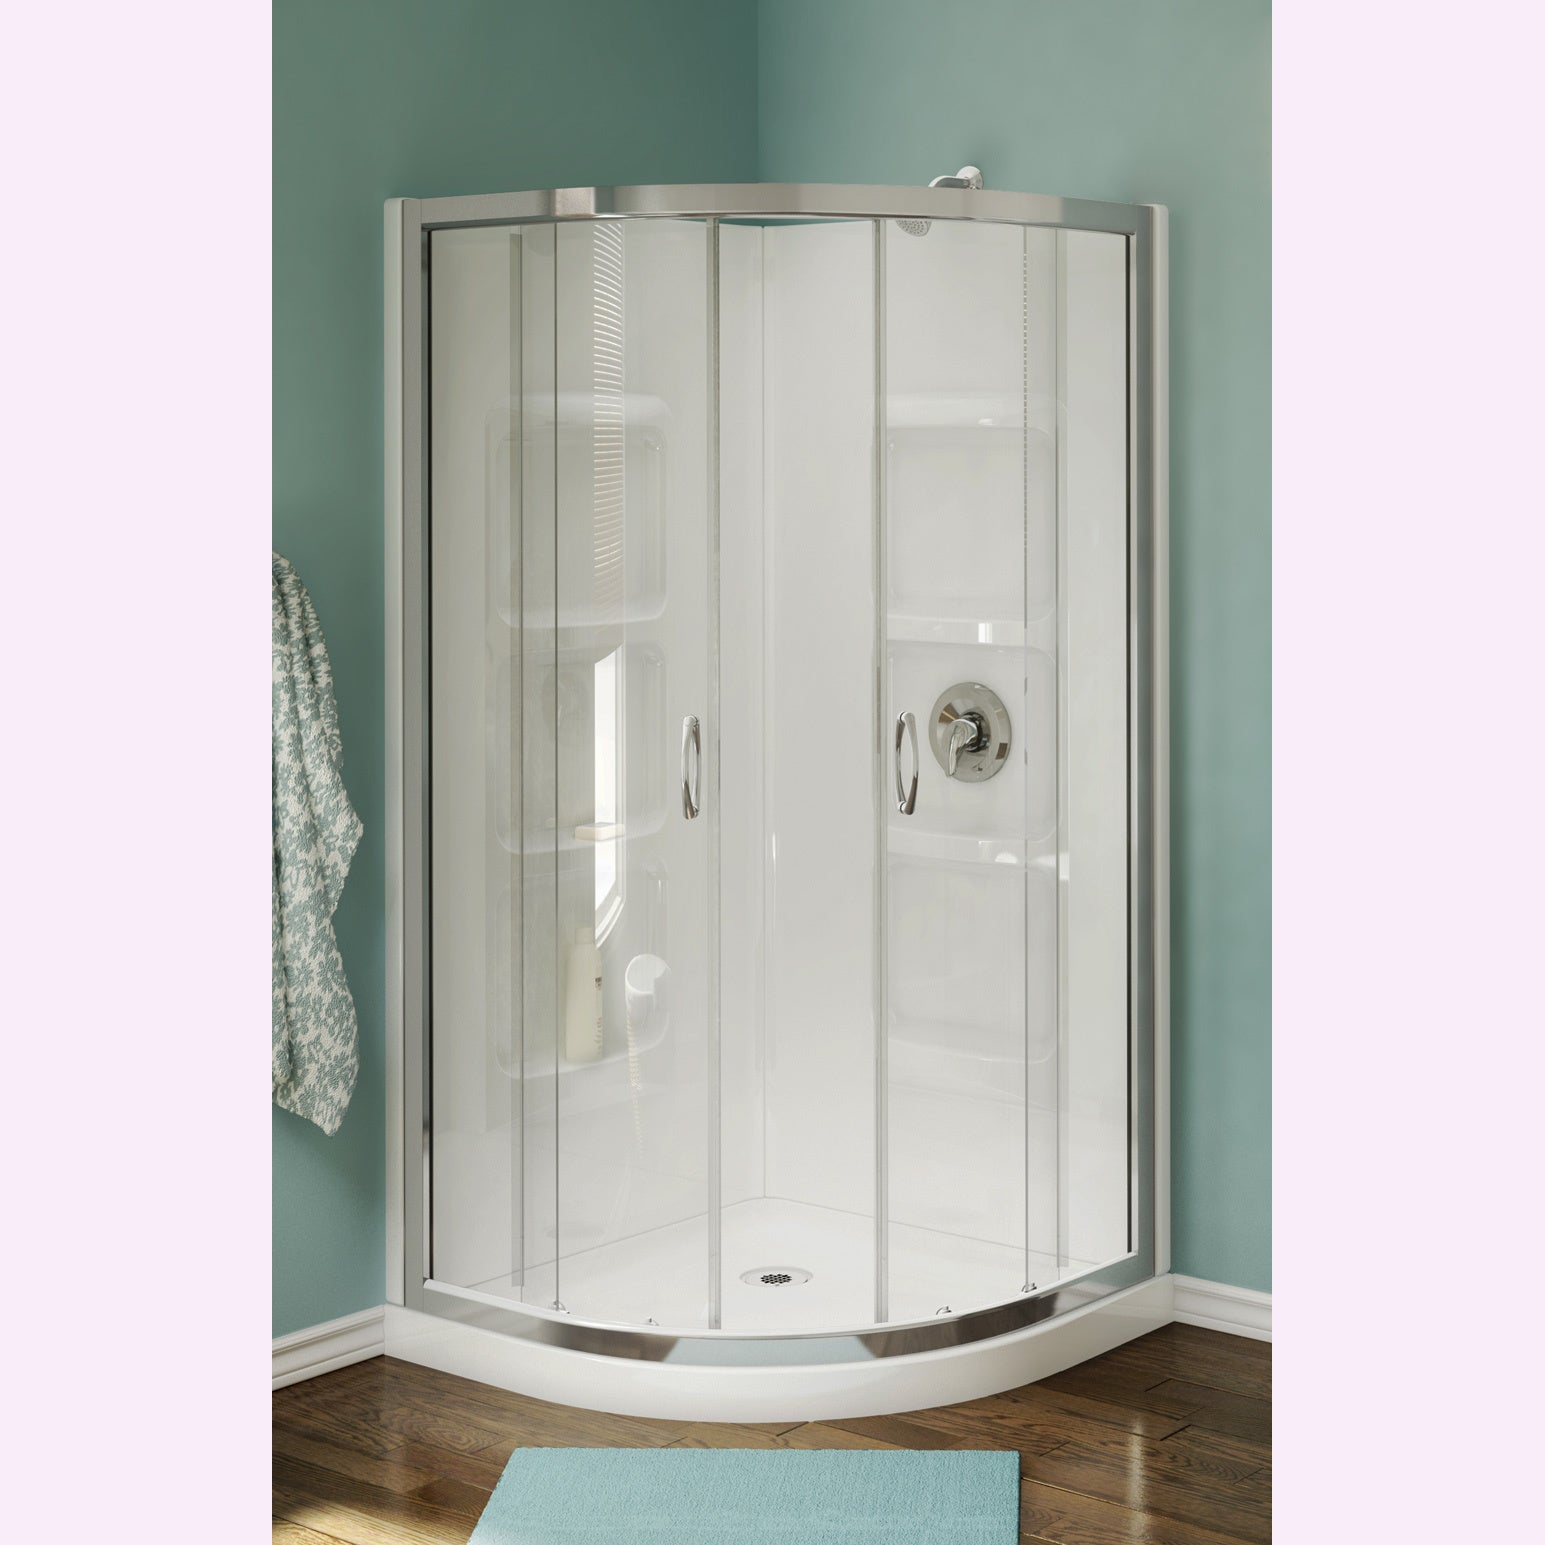 Shop Nevada 38-inch Pure Acrylic Neo-Round Corner Shower Stall ...